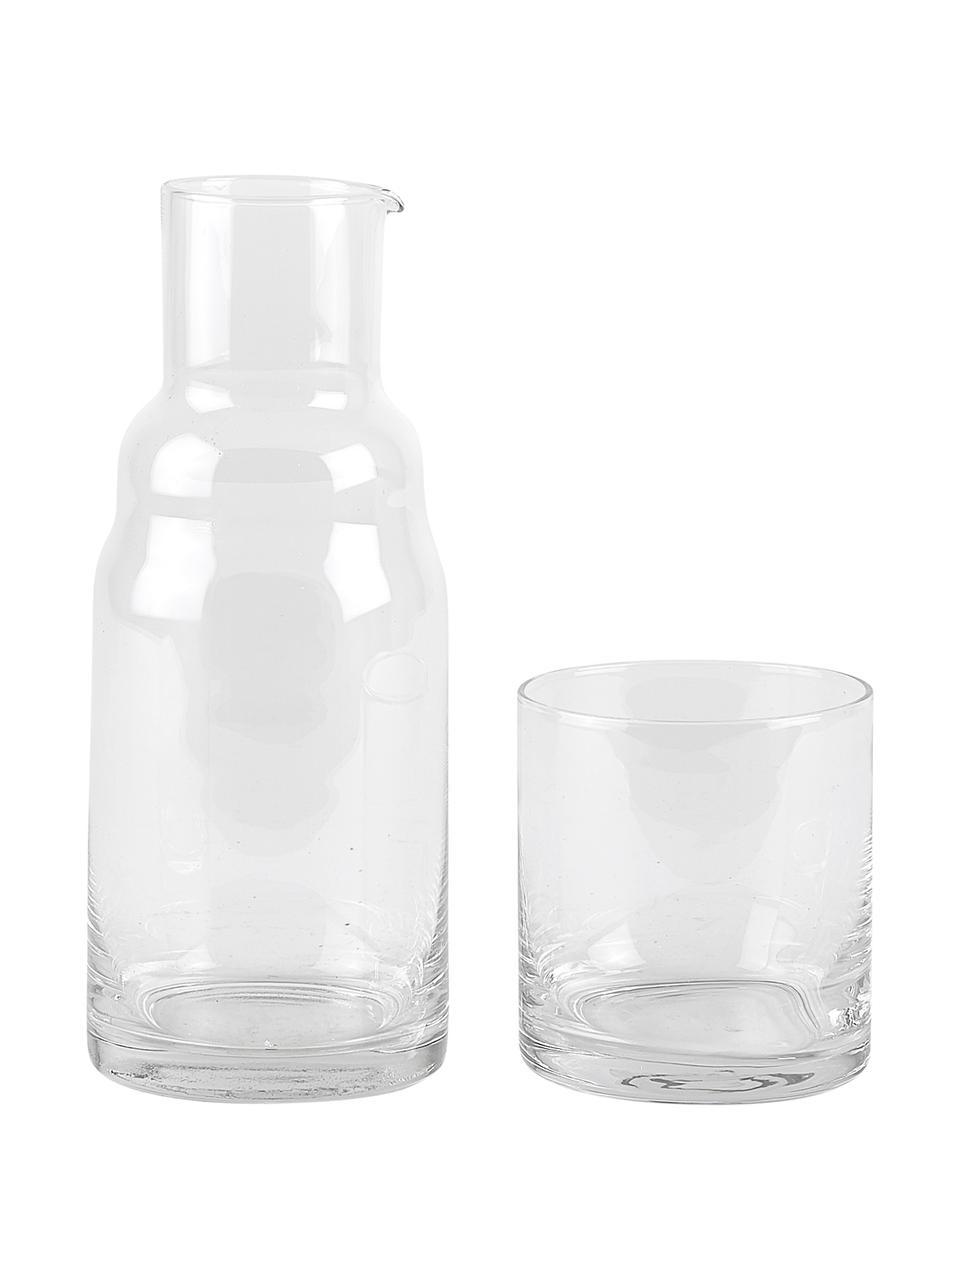 Karaffen-Set Wadi, 2-tlg., 800 ml, Glas, Transparent, H 21 cm